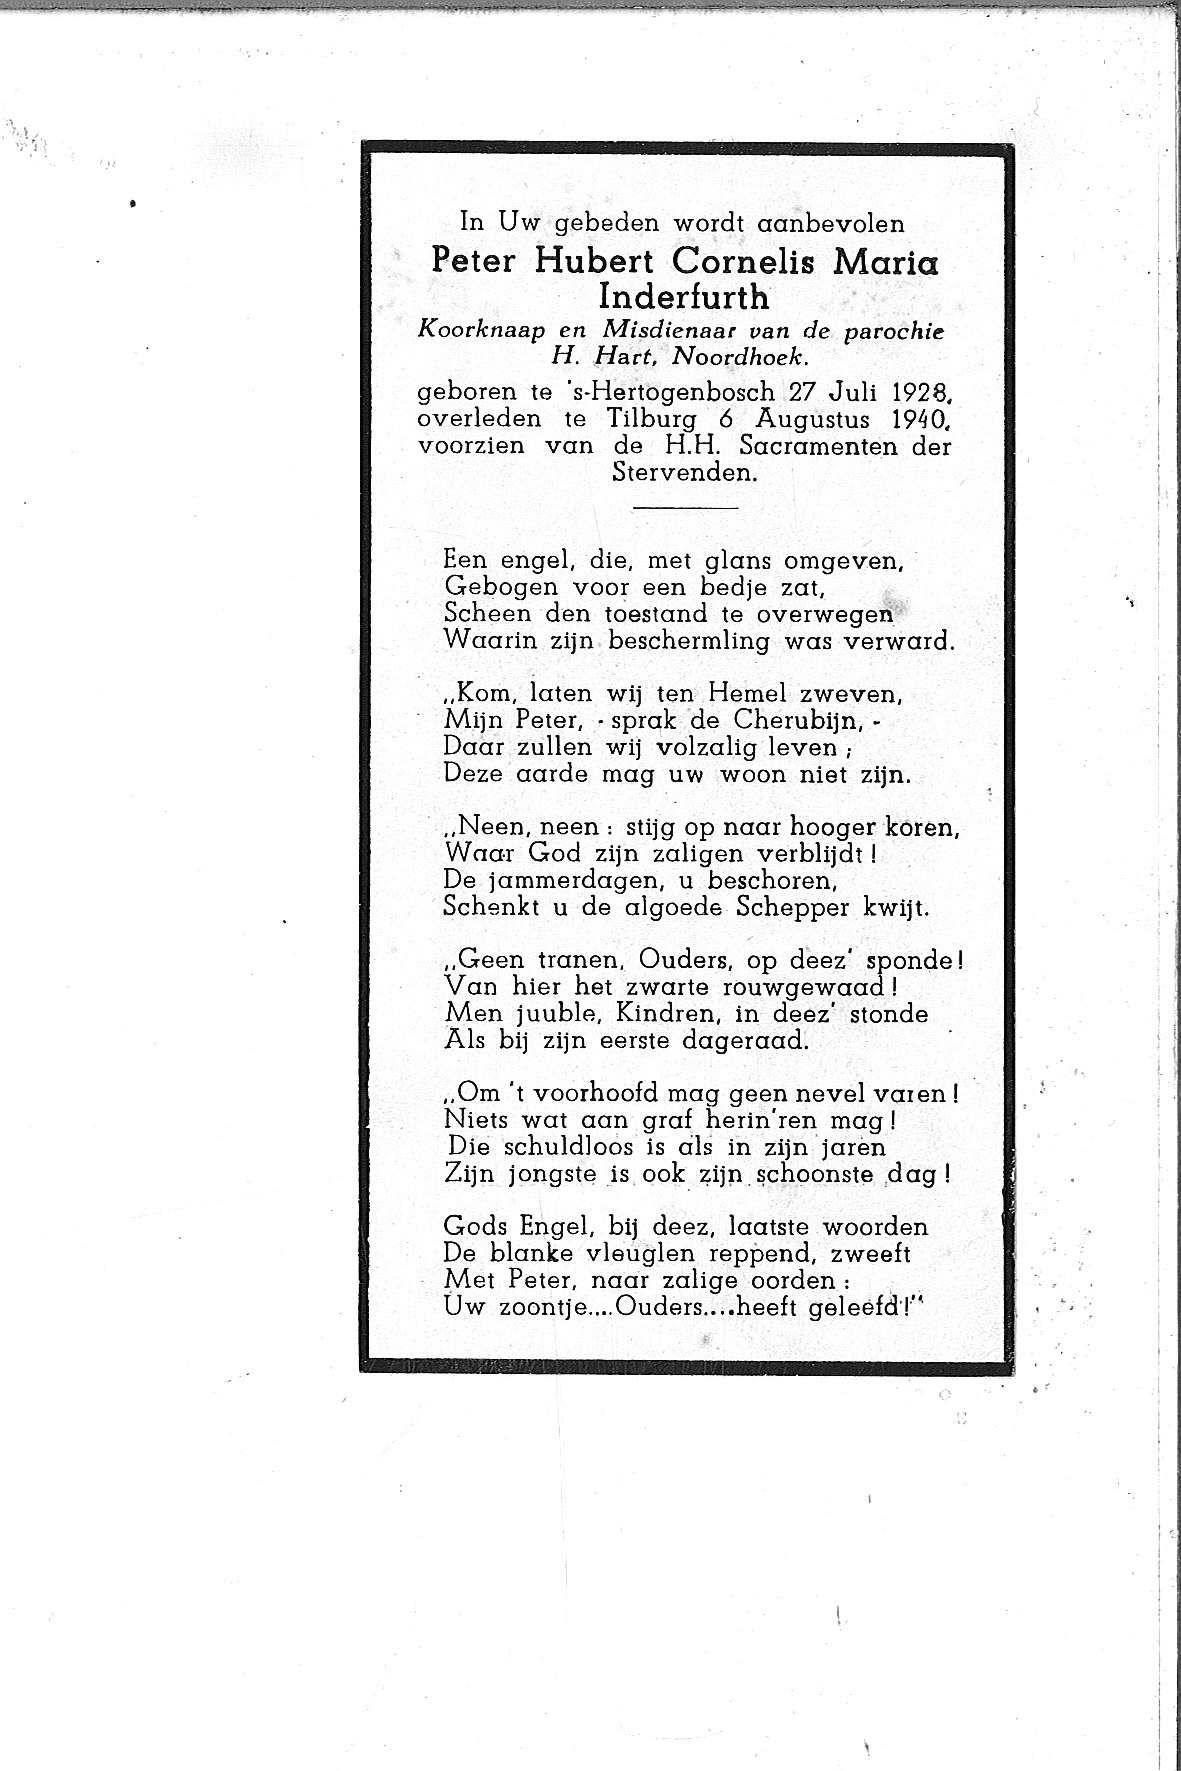 Peter-Hubert-Cornelis-Maria(1940)20140818111302_00015.jpg